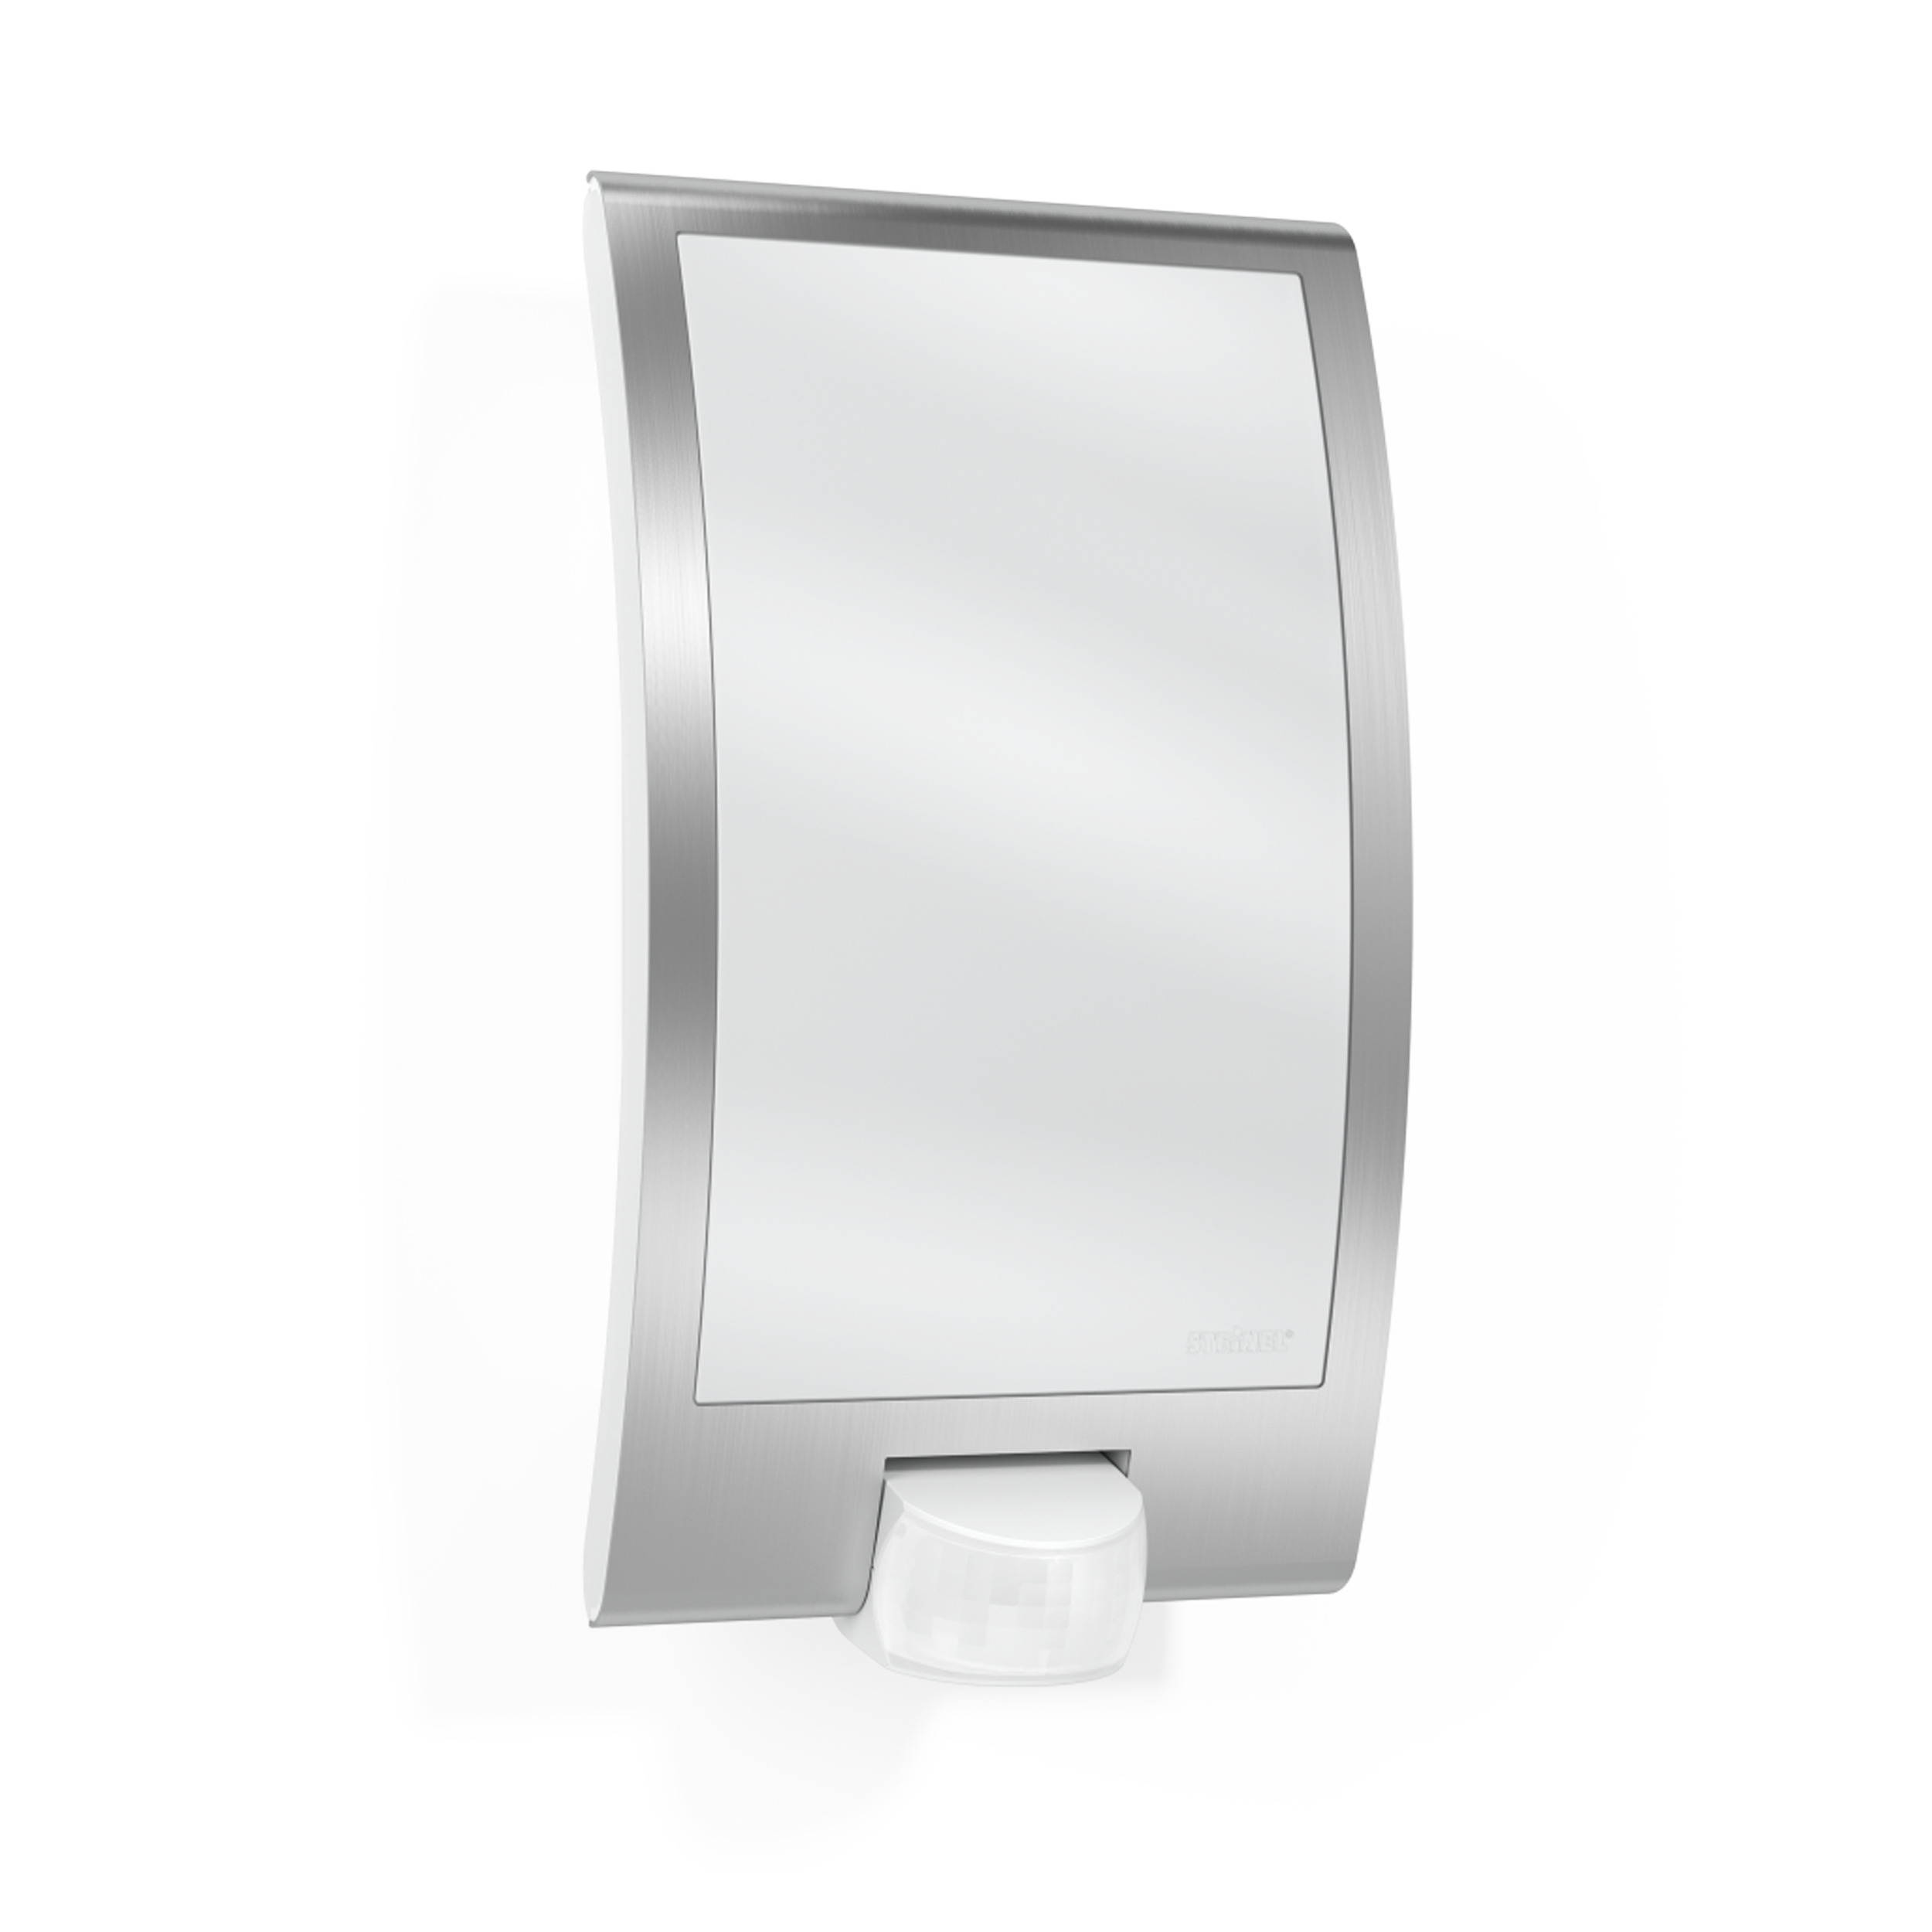 Steinel Sensor Buitenlamp L 22 wandmontage